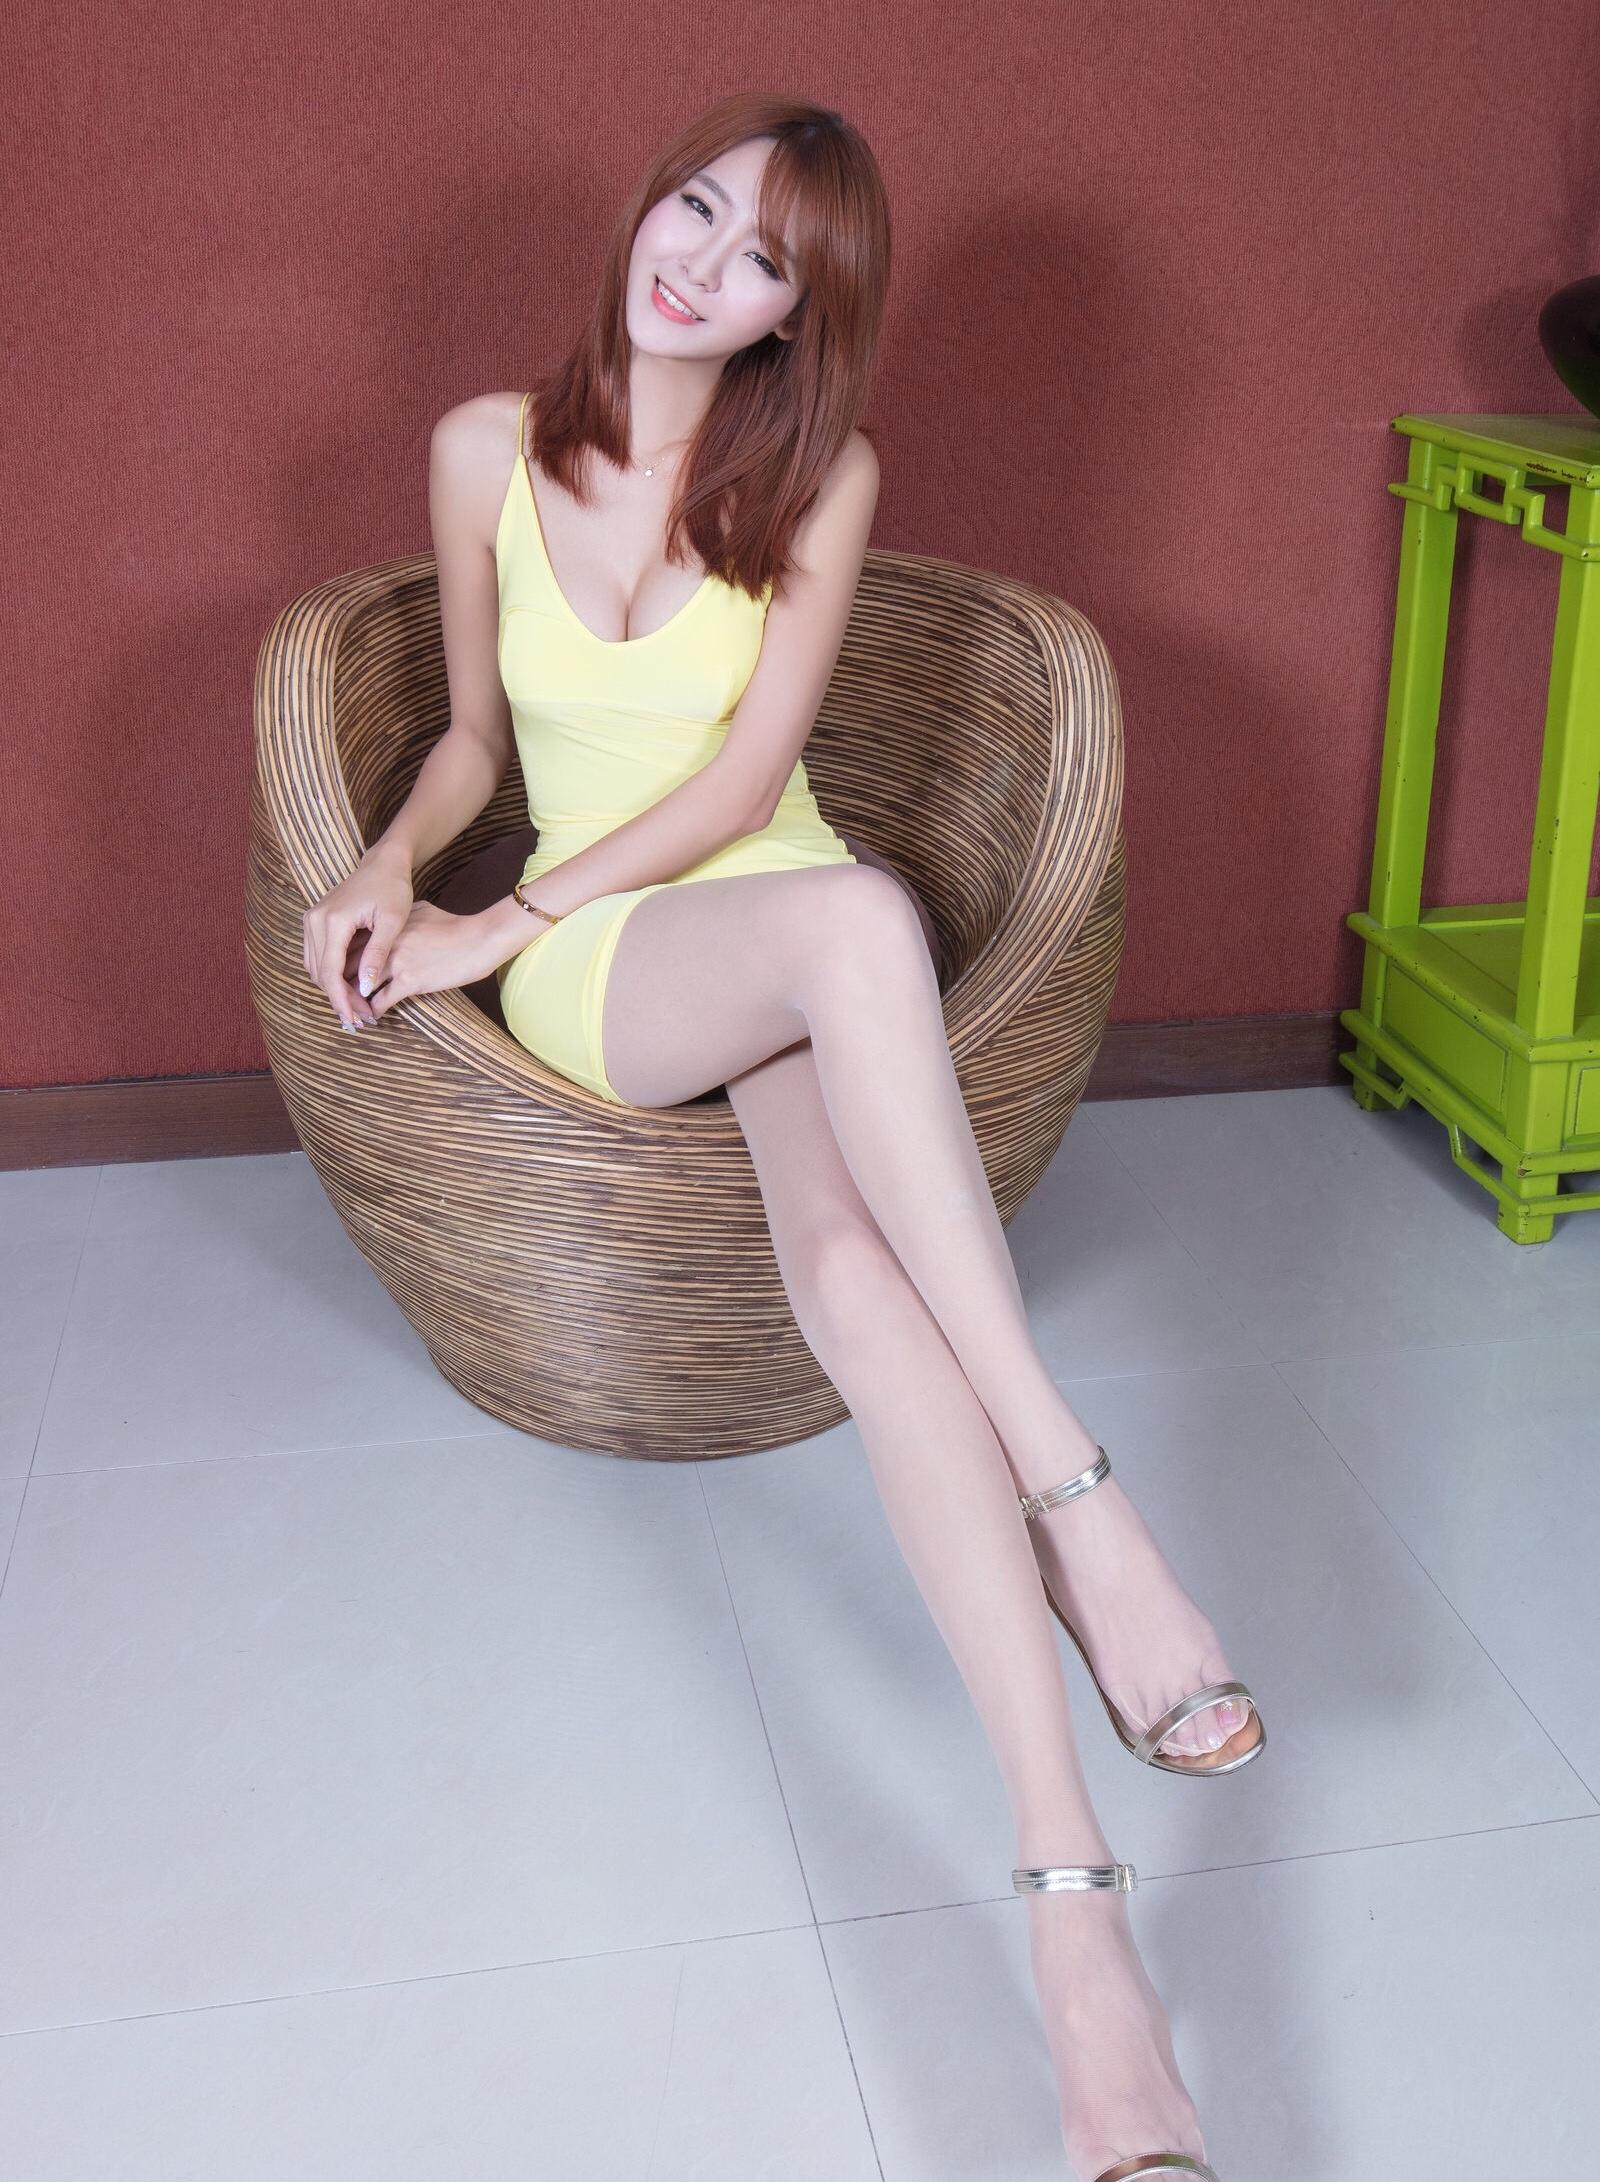 winnie(台湾腿模丝袜美腿) 15